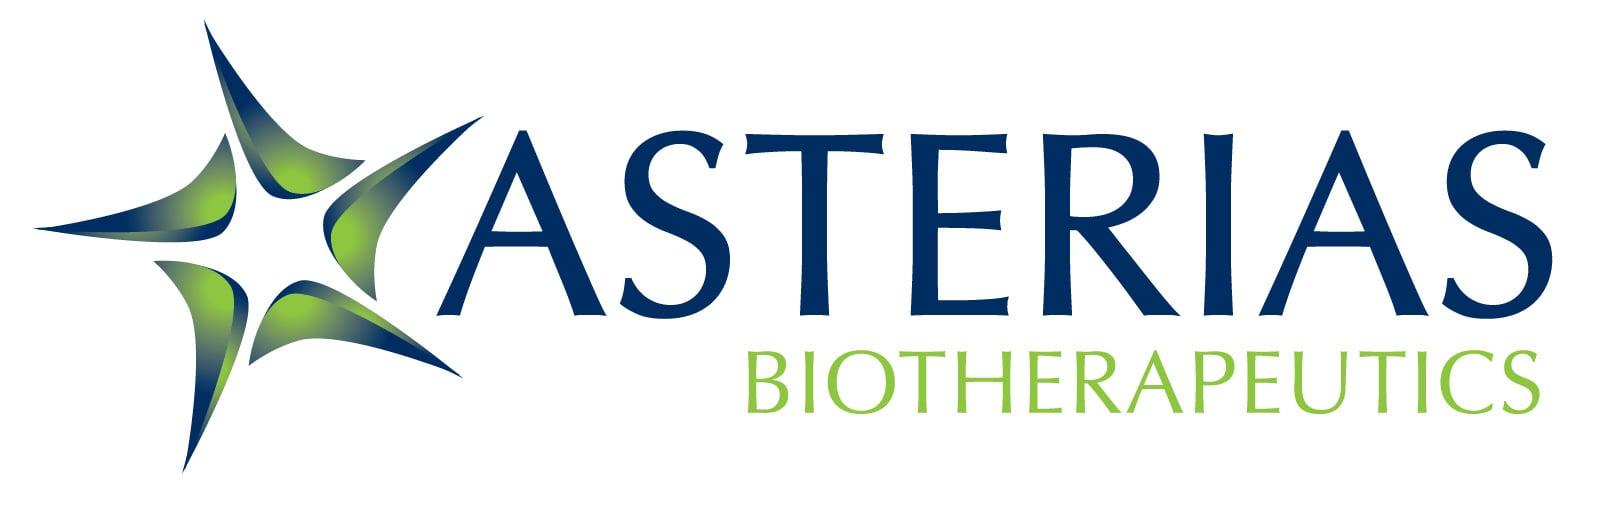 Asterias Biotherapeutics logo